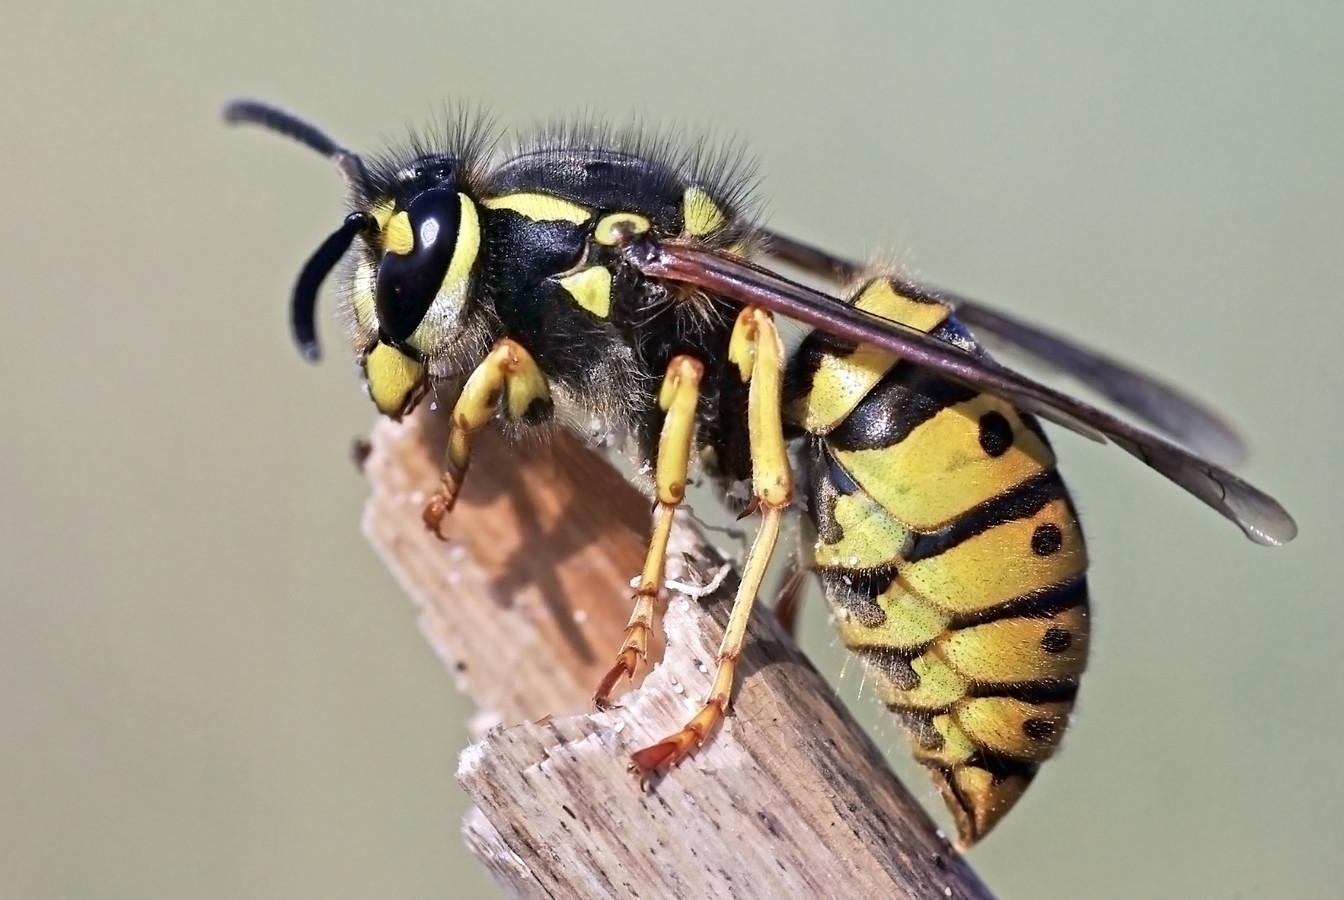 Vespula germanica stockadr wesp